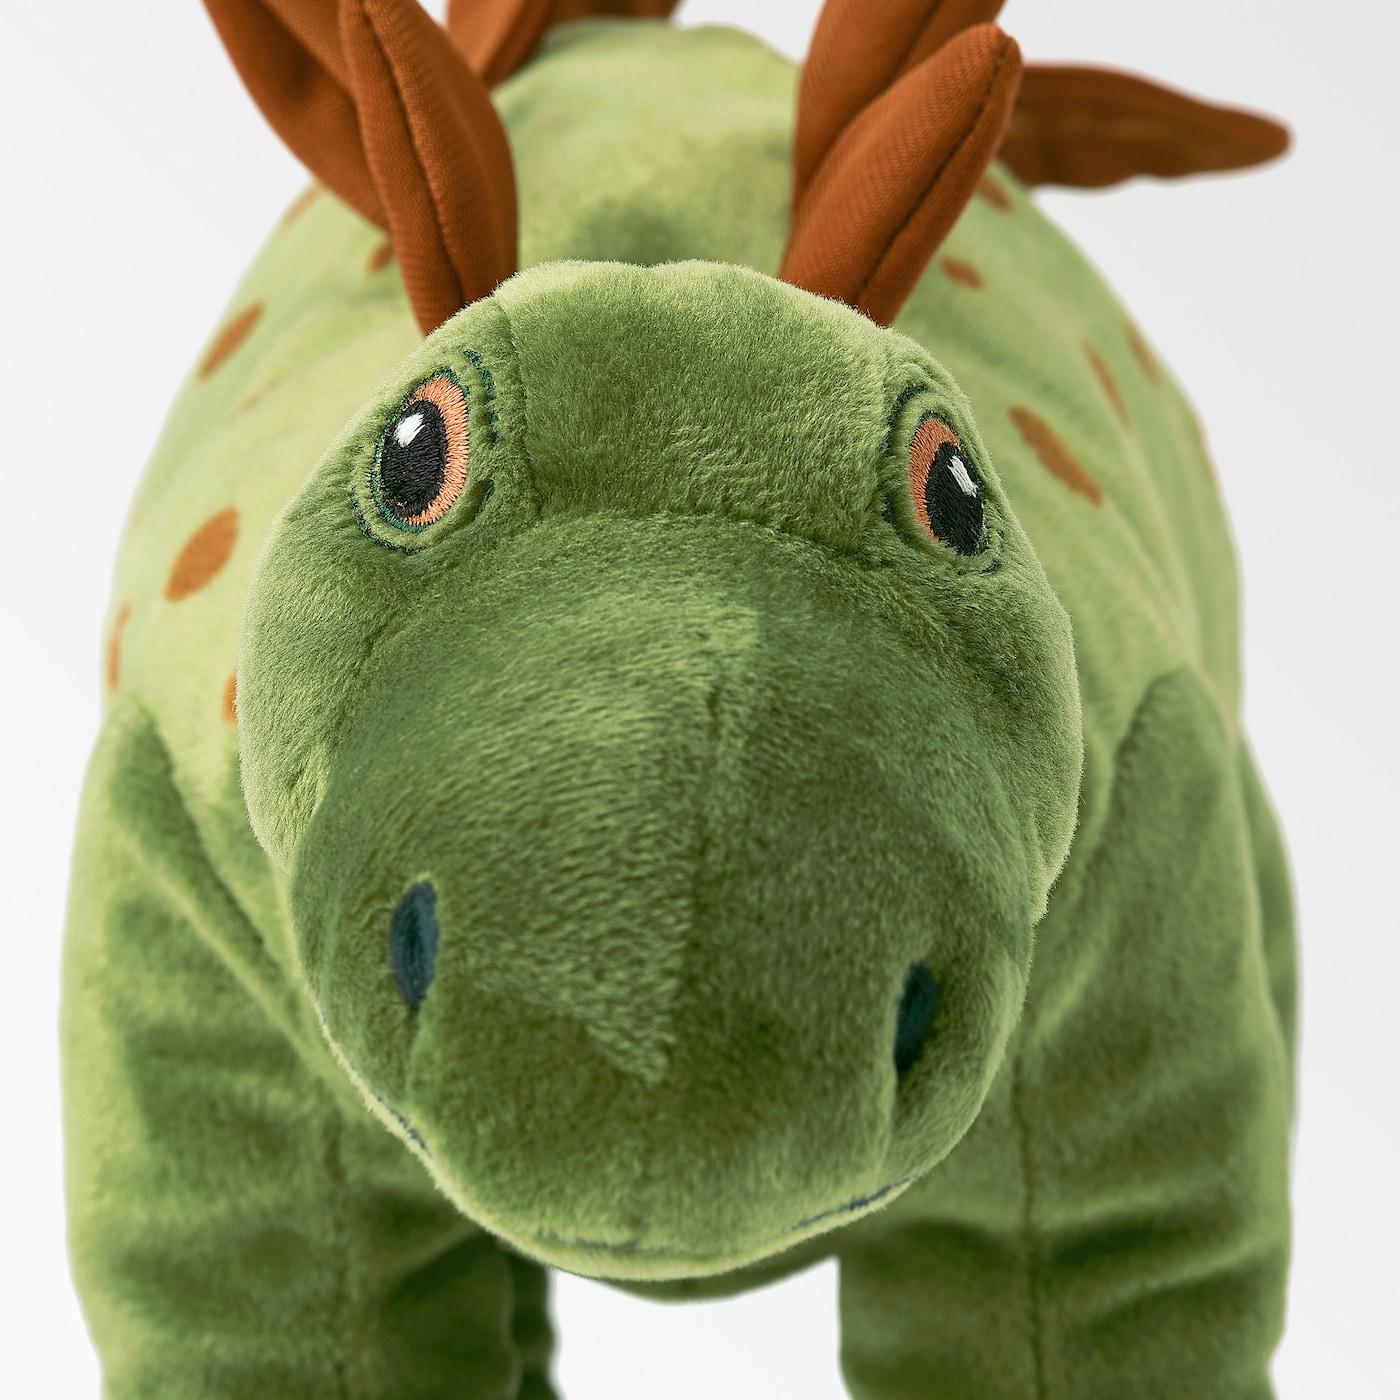 JÄTTELIK 耶特里克 毛绒玩具, 恐龙/恐龙/剑龙, 50 厘米